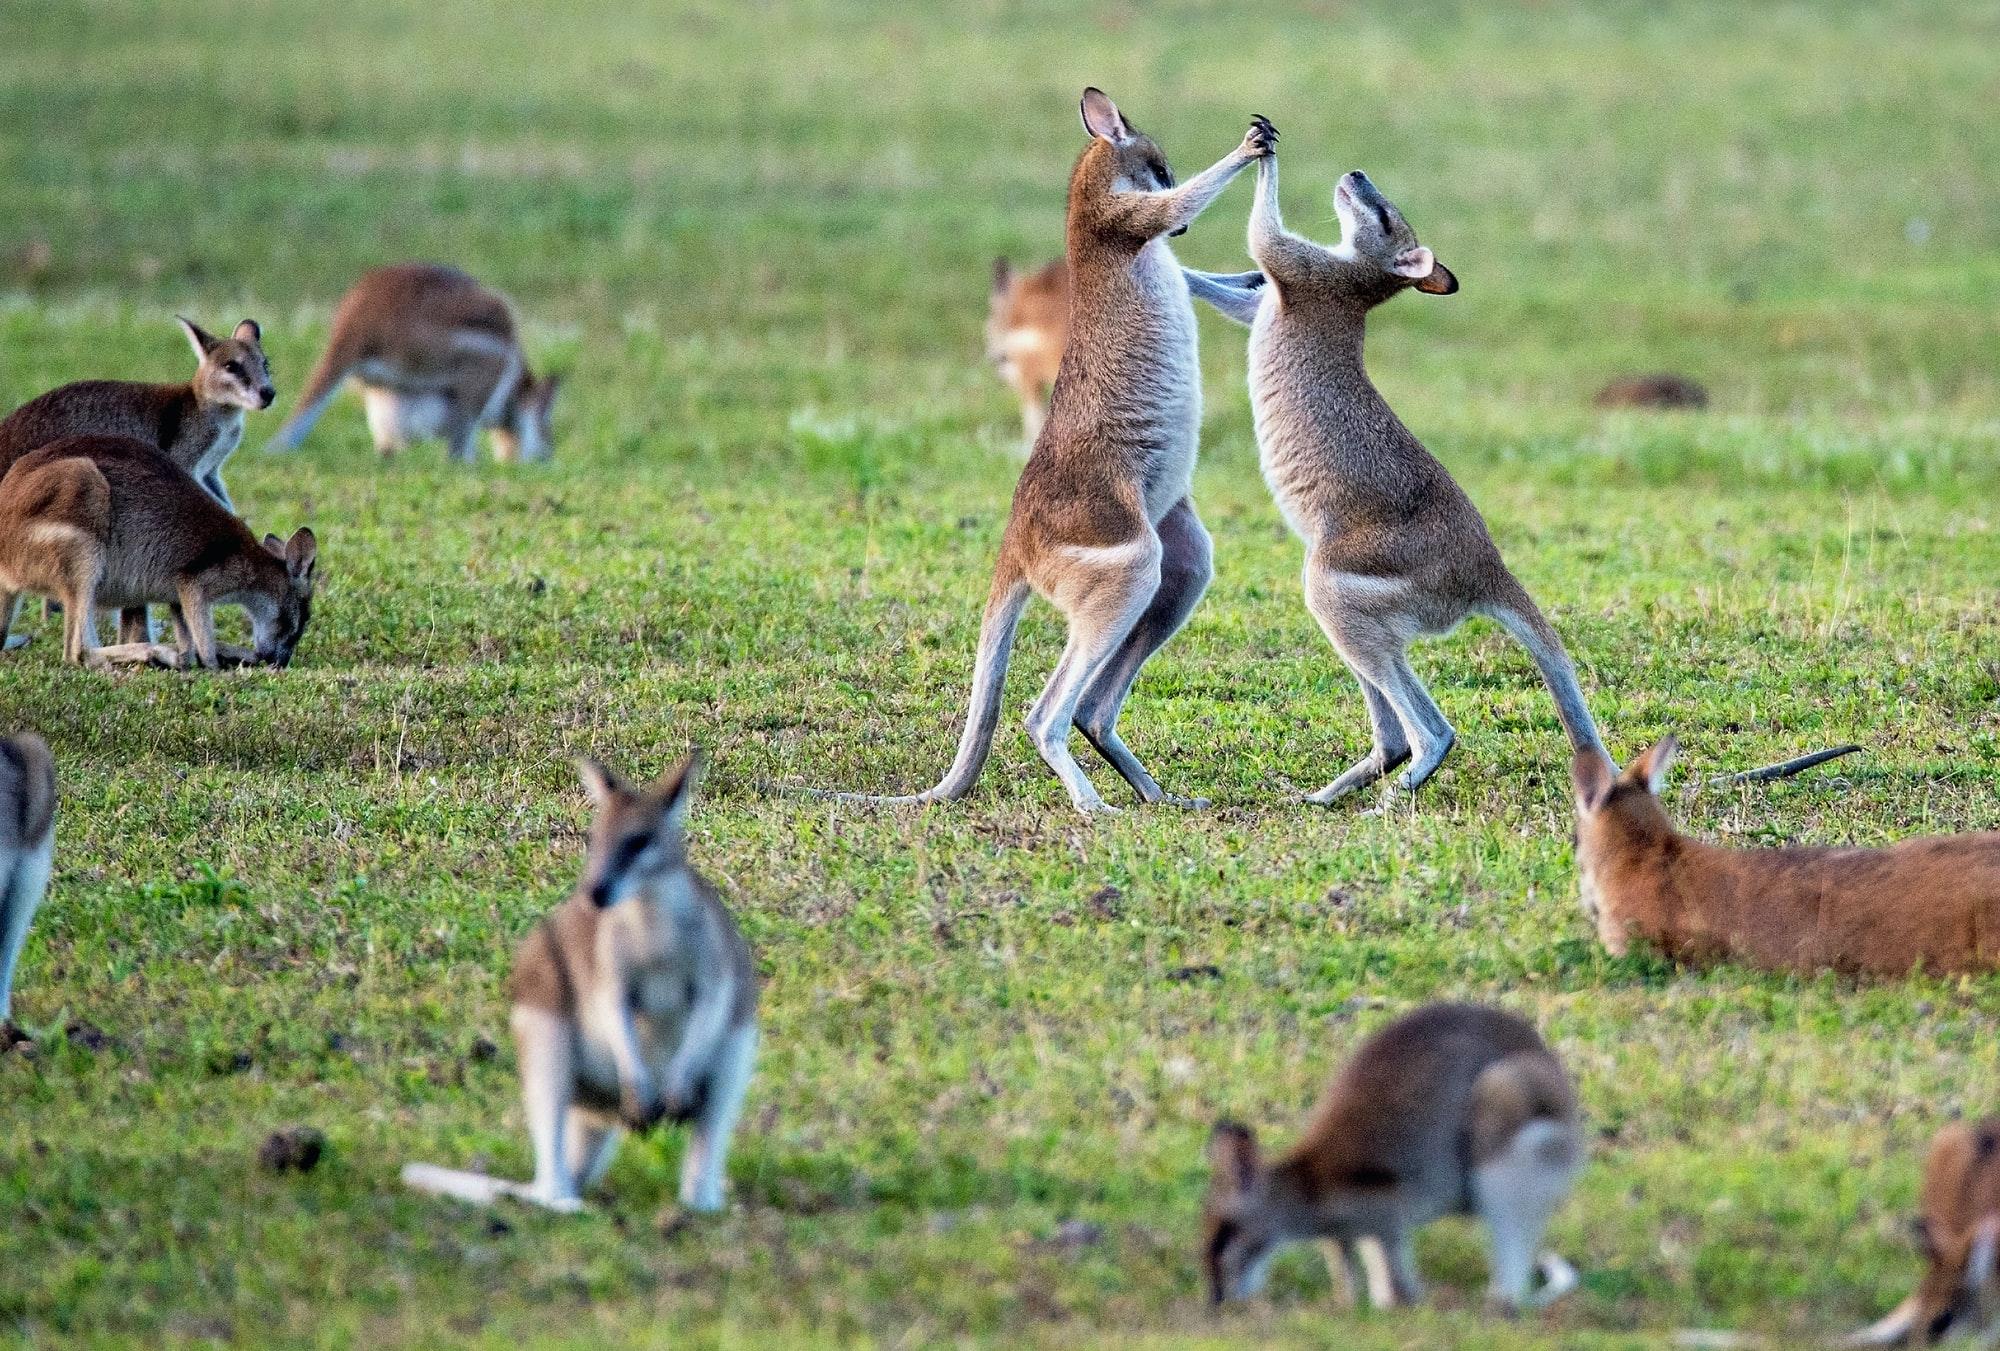 Learning Australia's Lessons